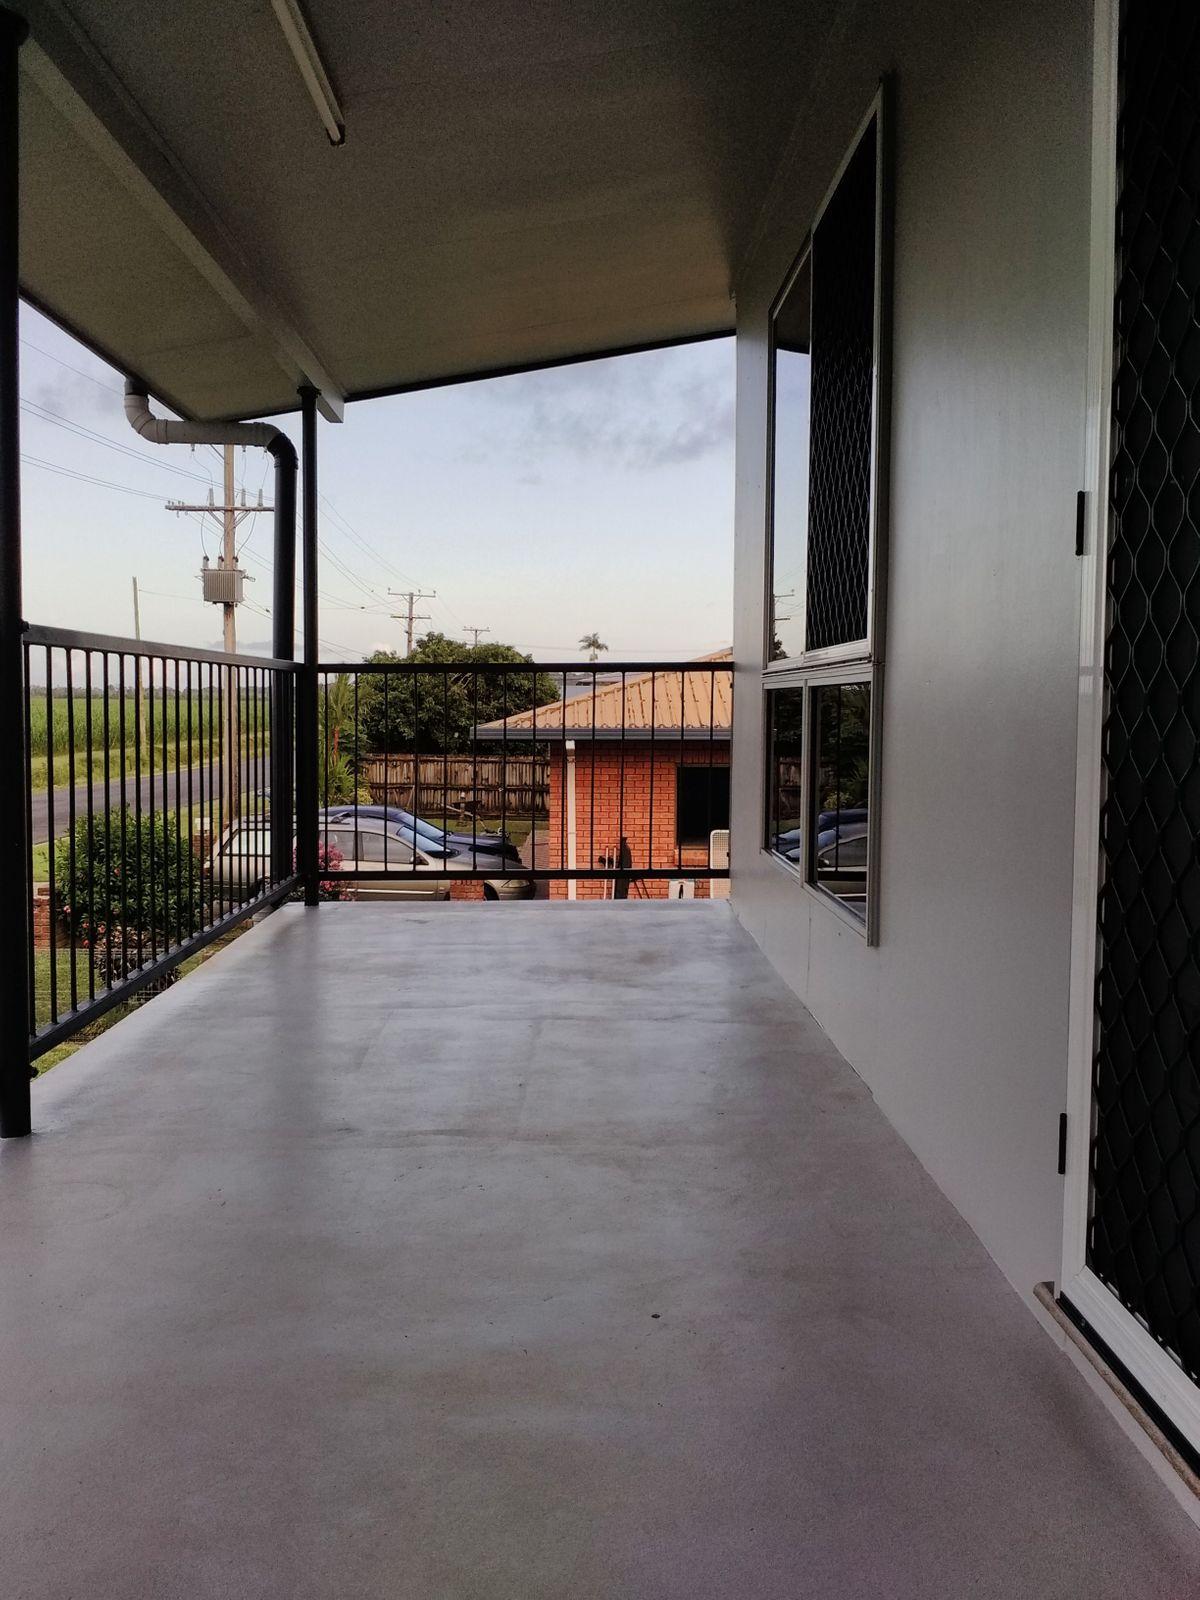 2 Aluart Road, Innisfail Estate, QLD 4860